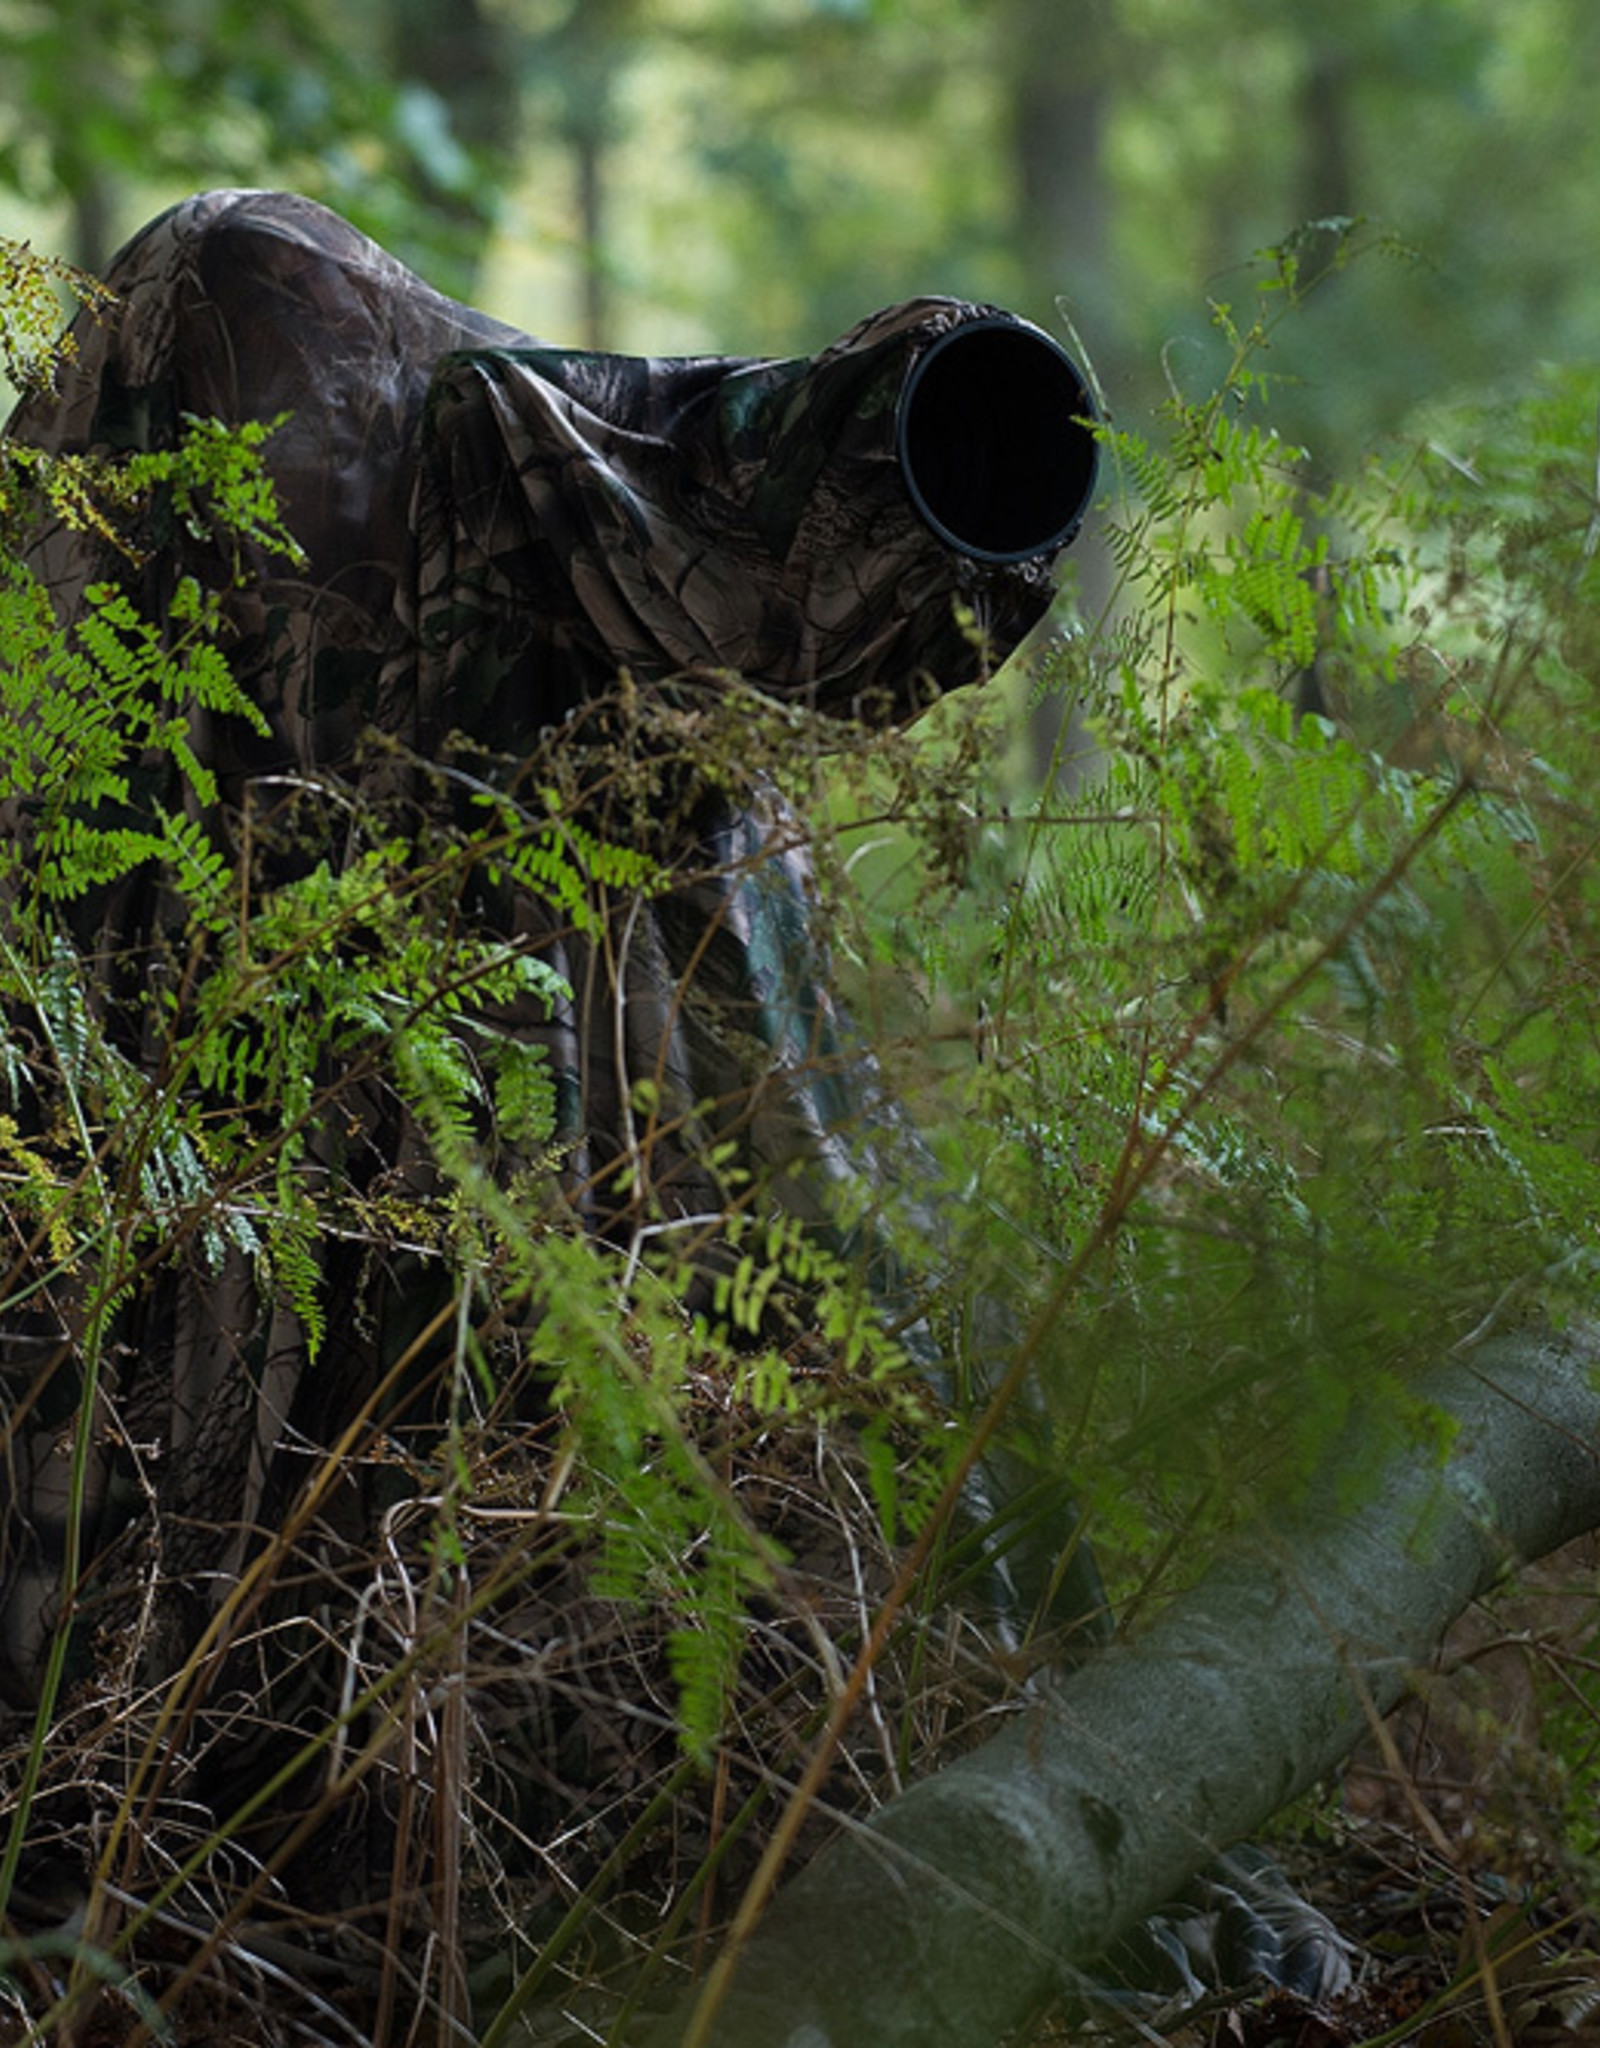 HBN - Enjoy Wildlife! HBN Topcamo II camouflage cloth